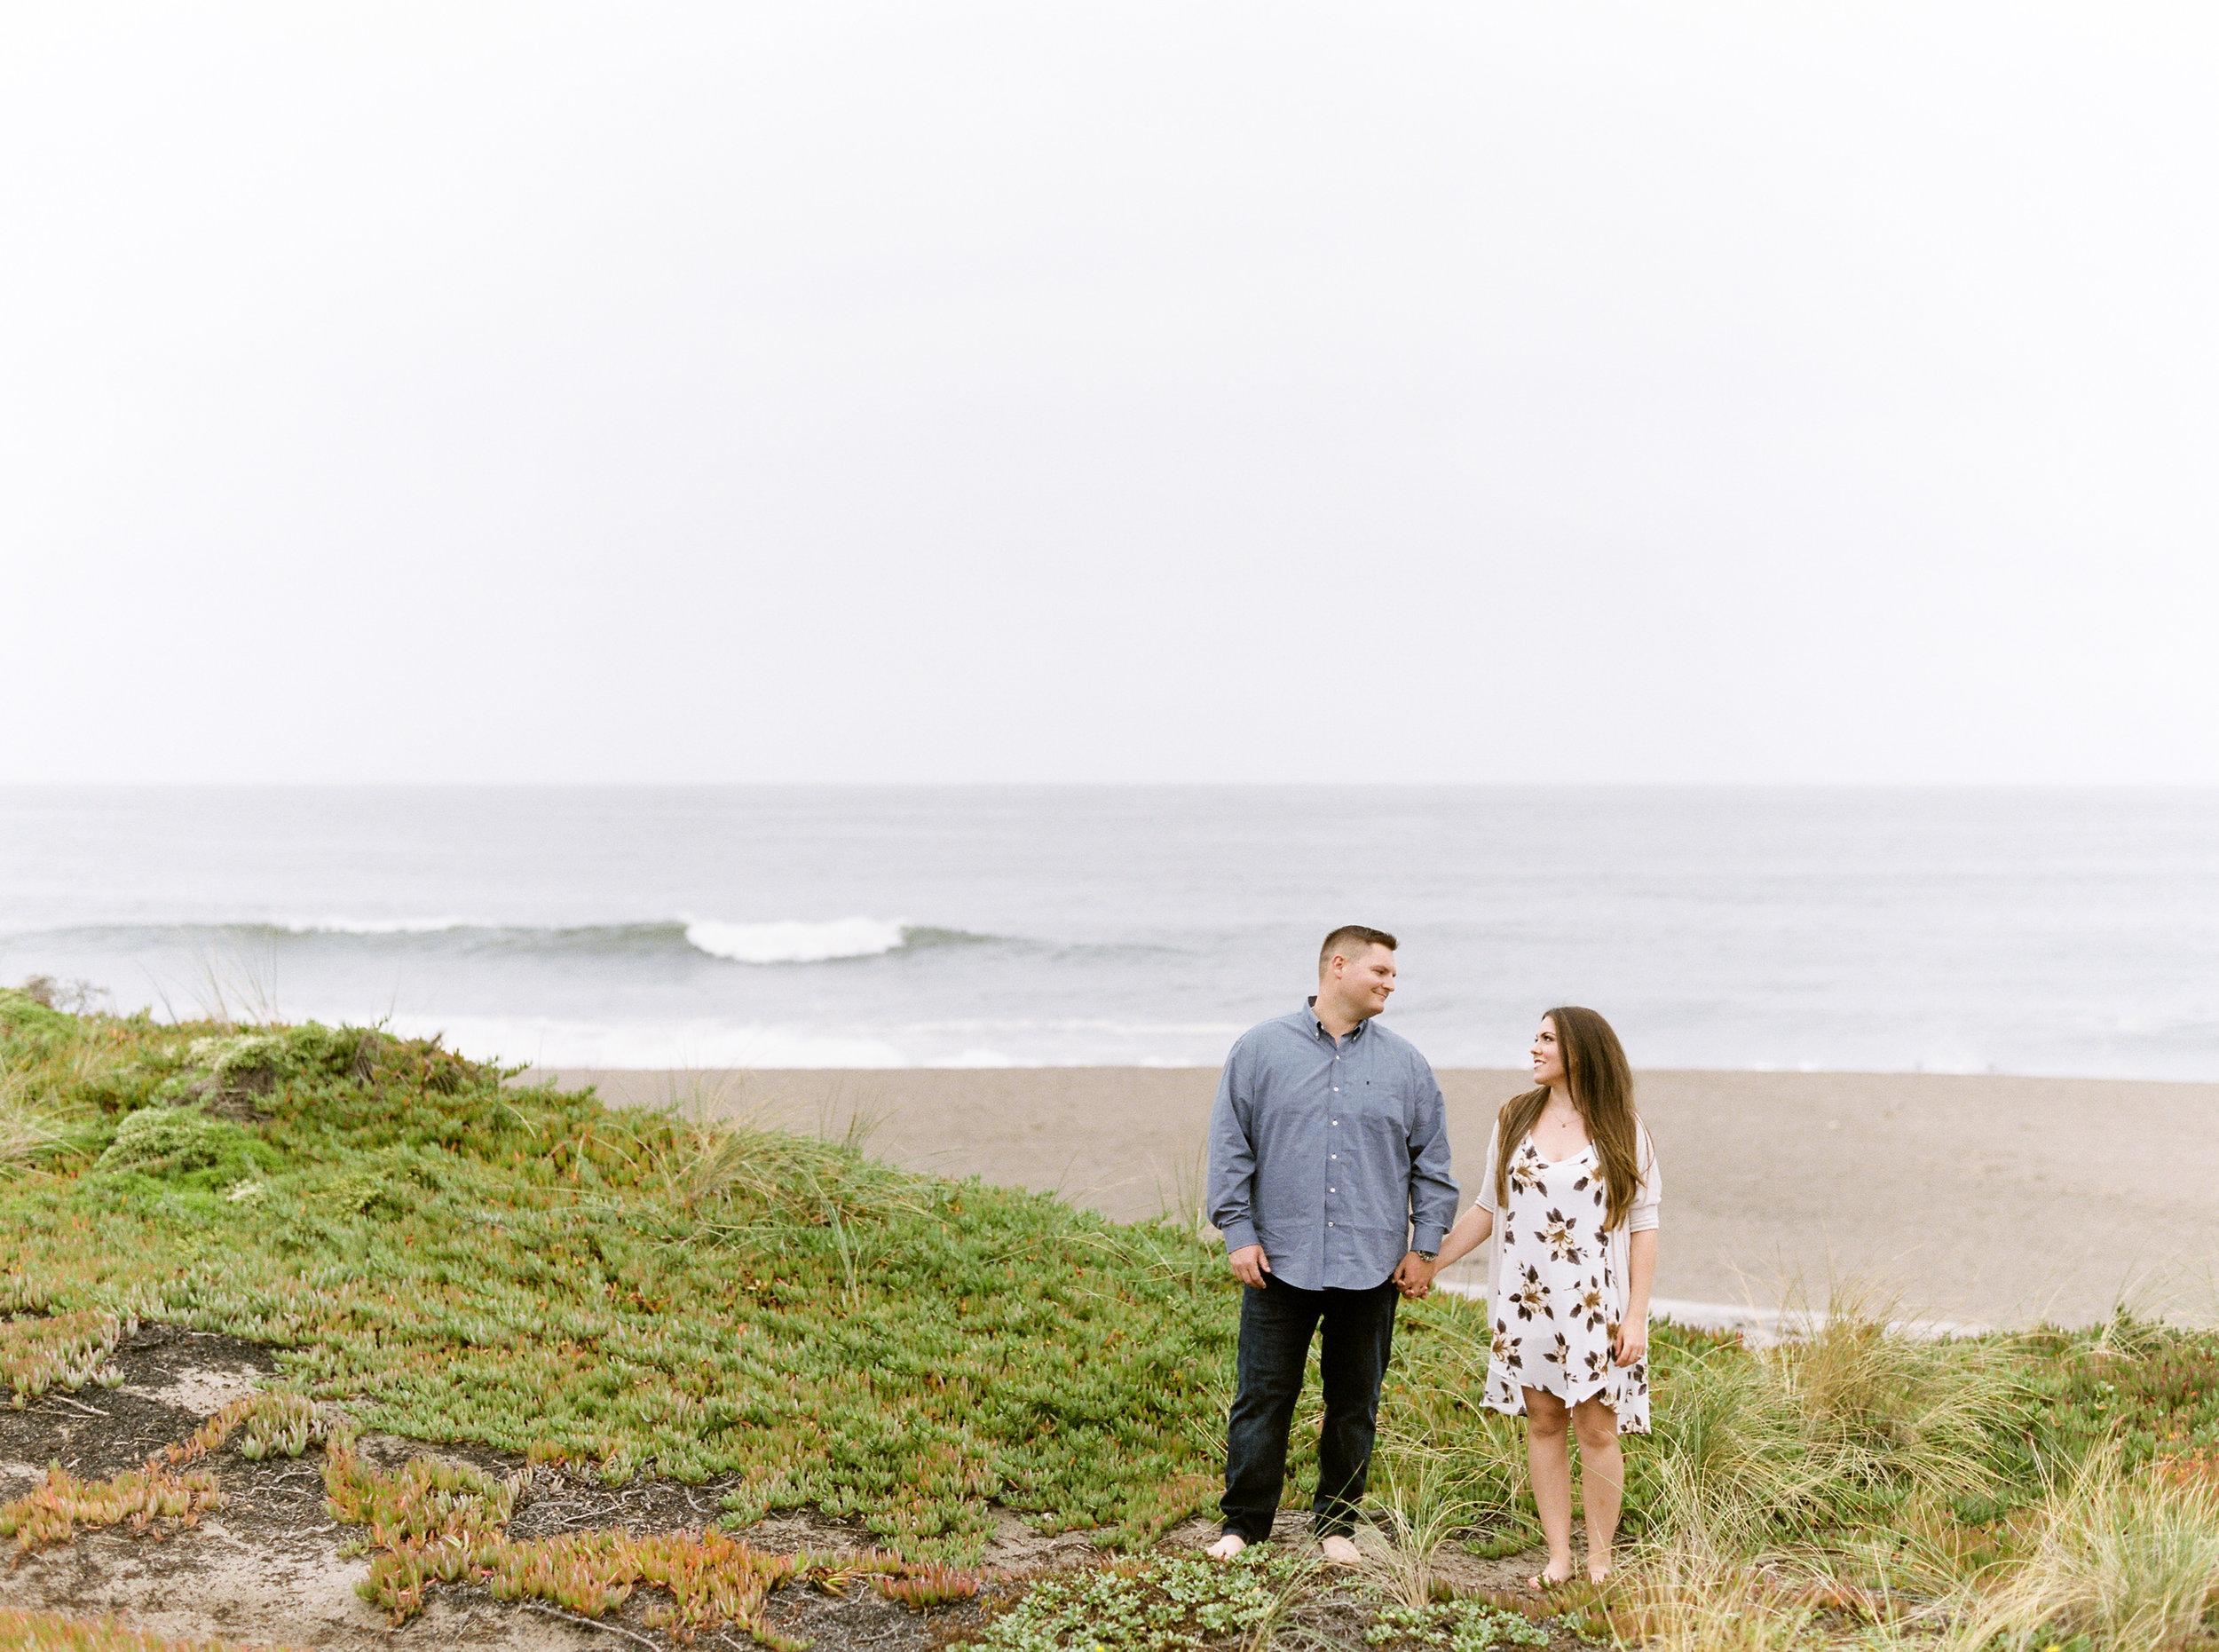 Point-reyes-california-engagement-photographer-37.jpg